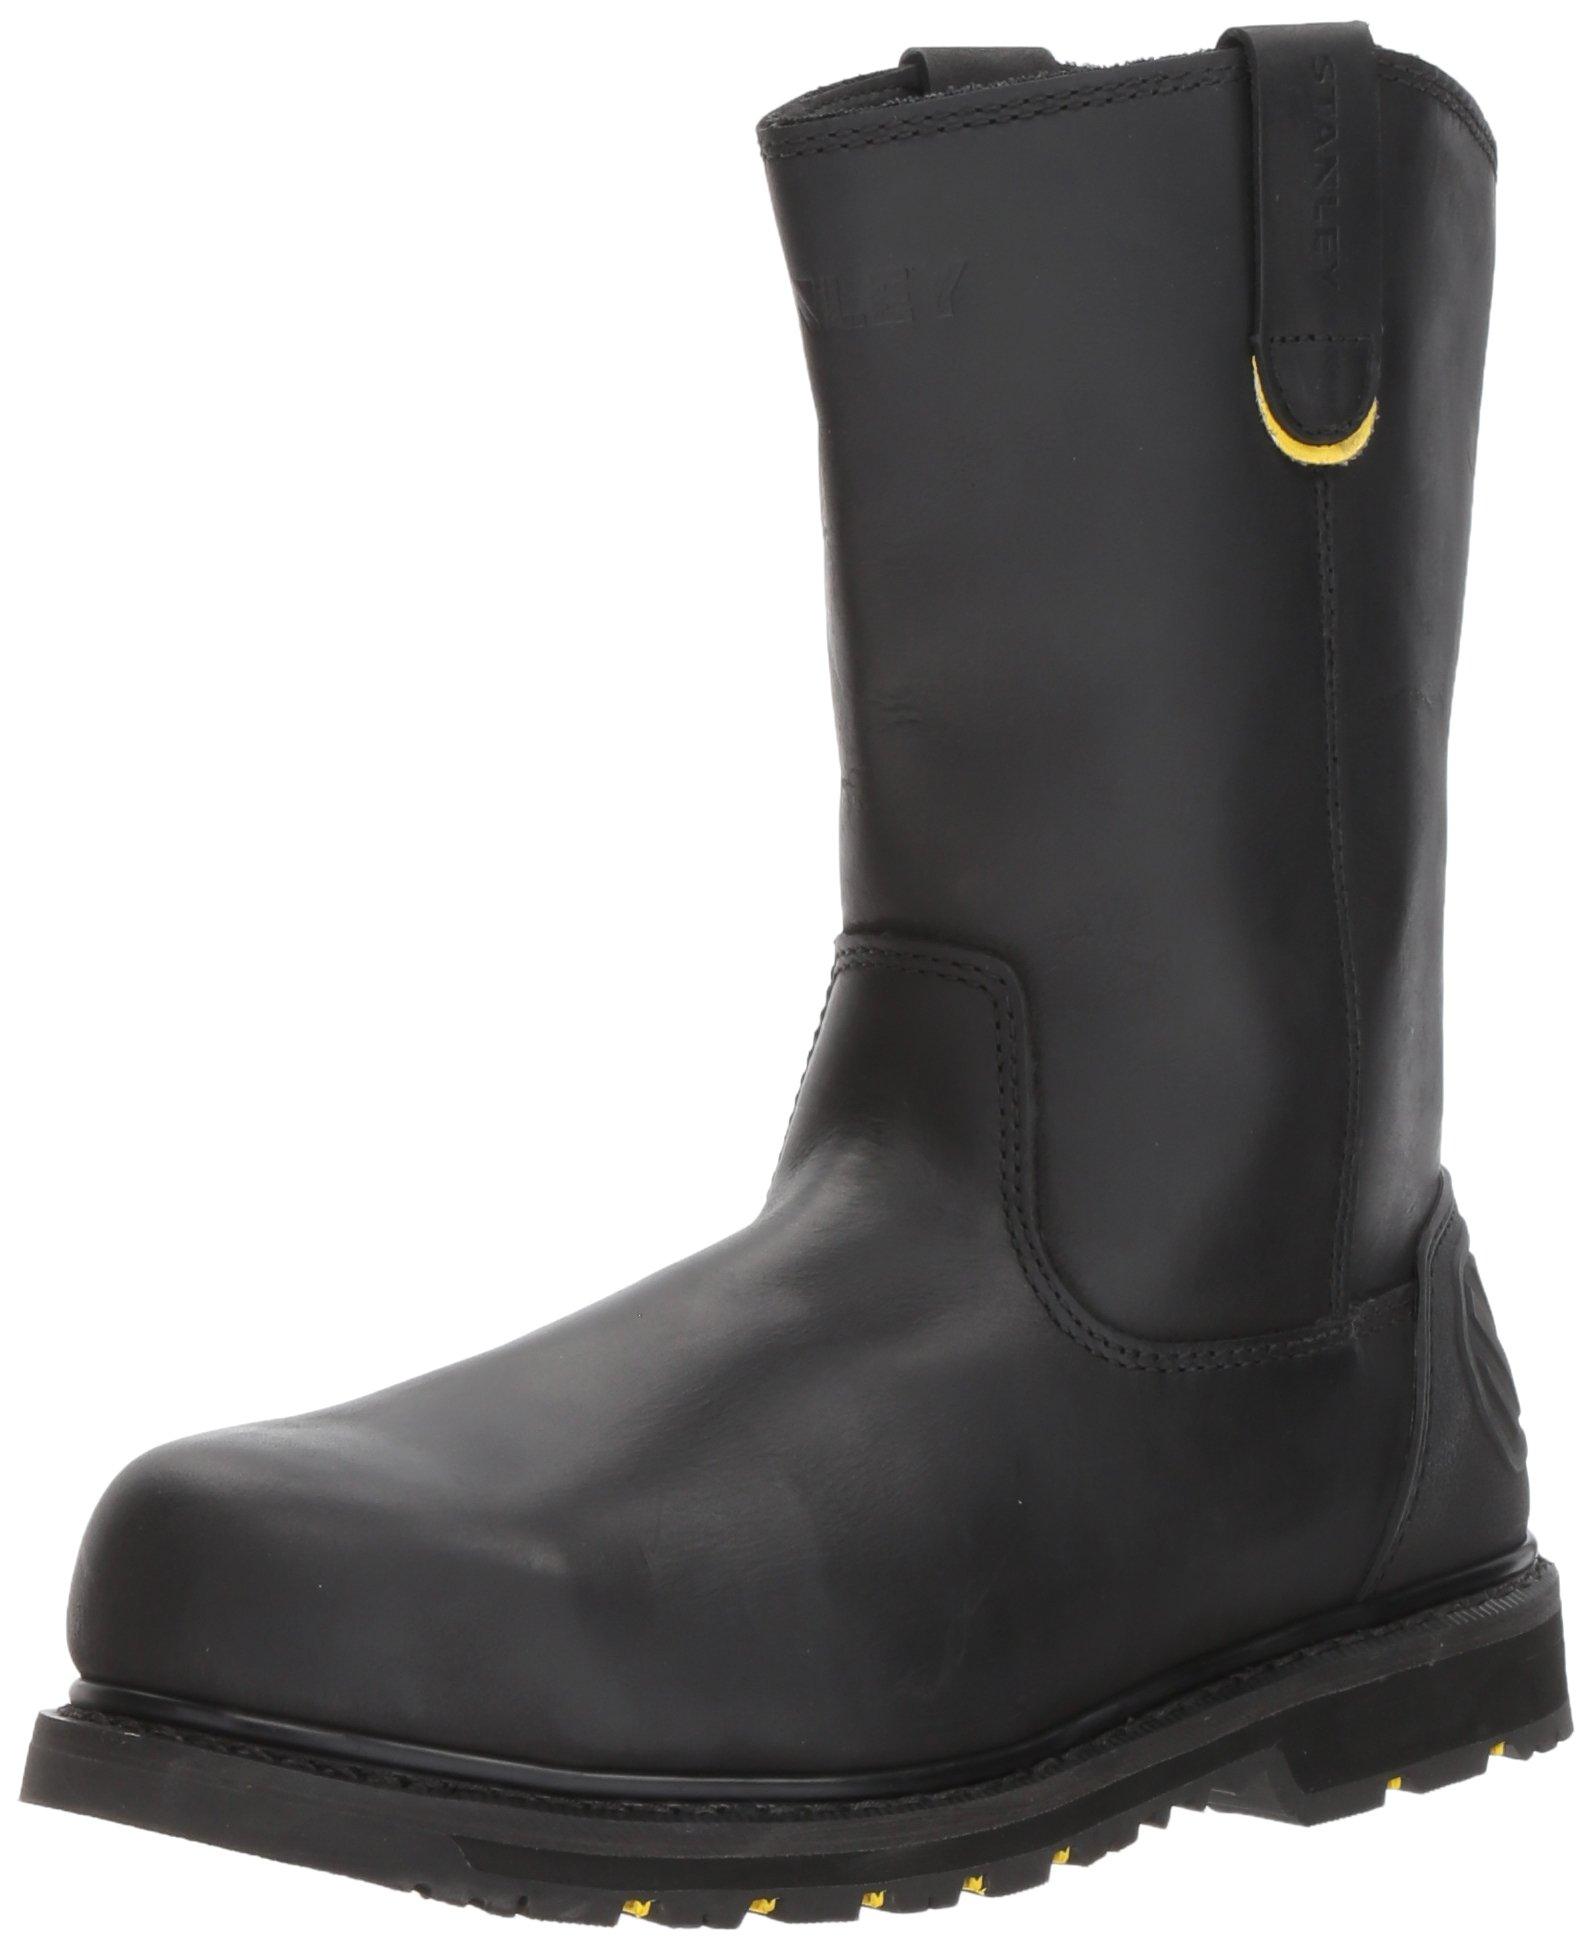 Stanley Men's Dropper 2.0 Steel Toe Industrial and Construction Shoe, Black, 11 M US